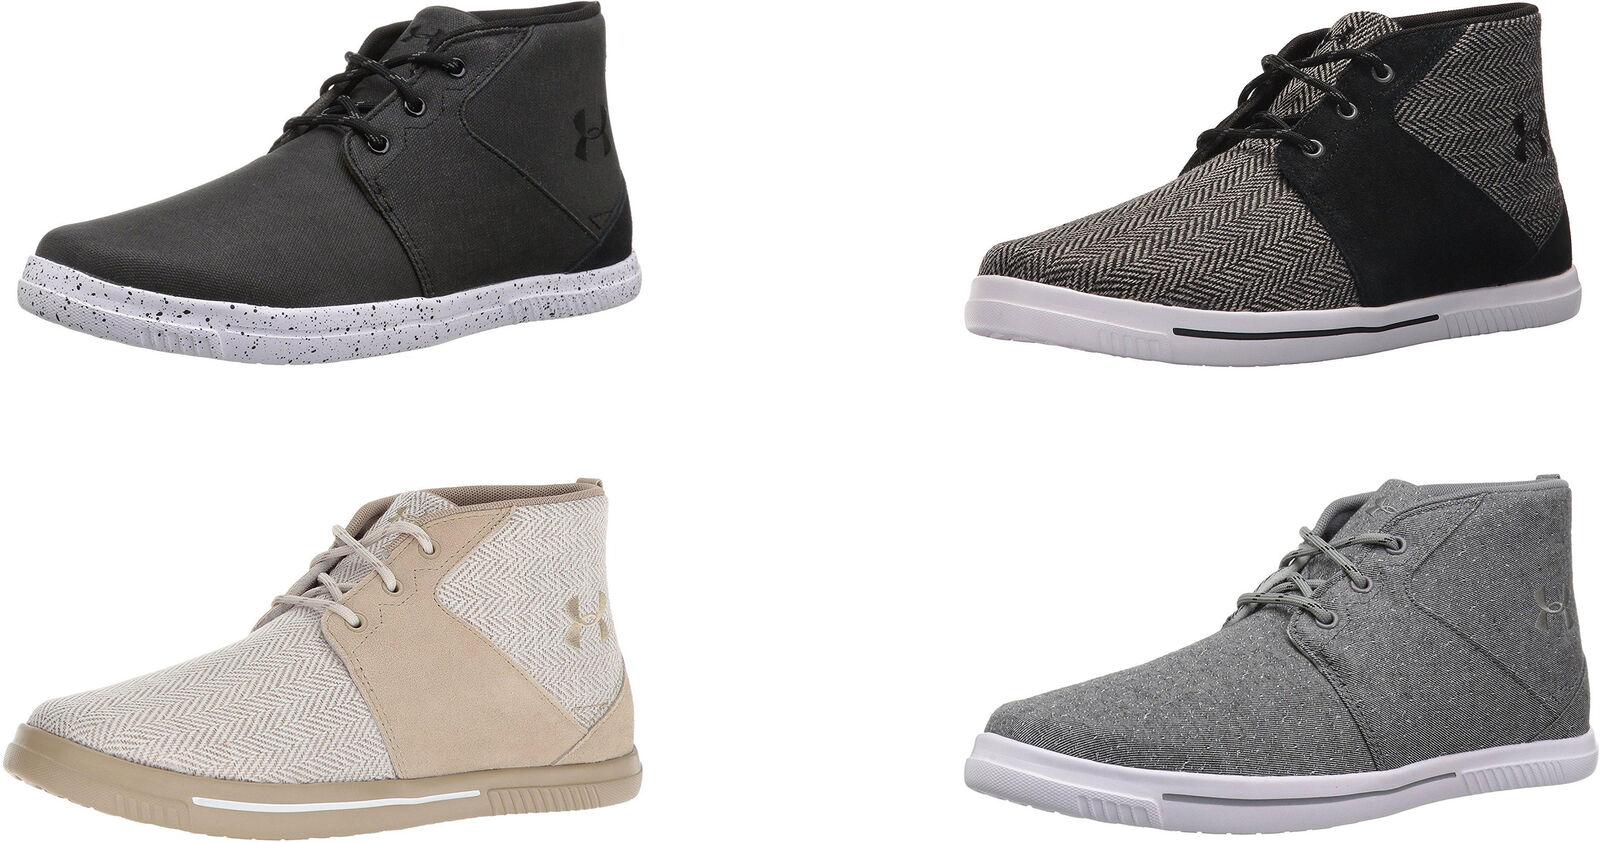 Street Encounter IV Mid Shoes